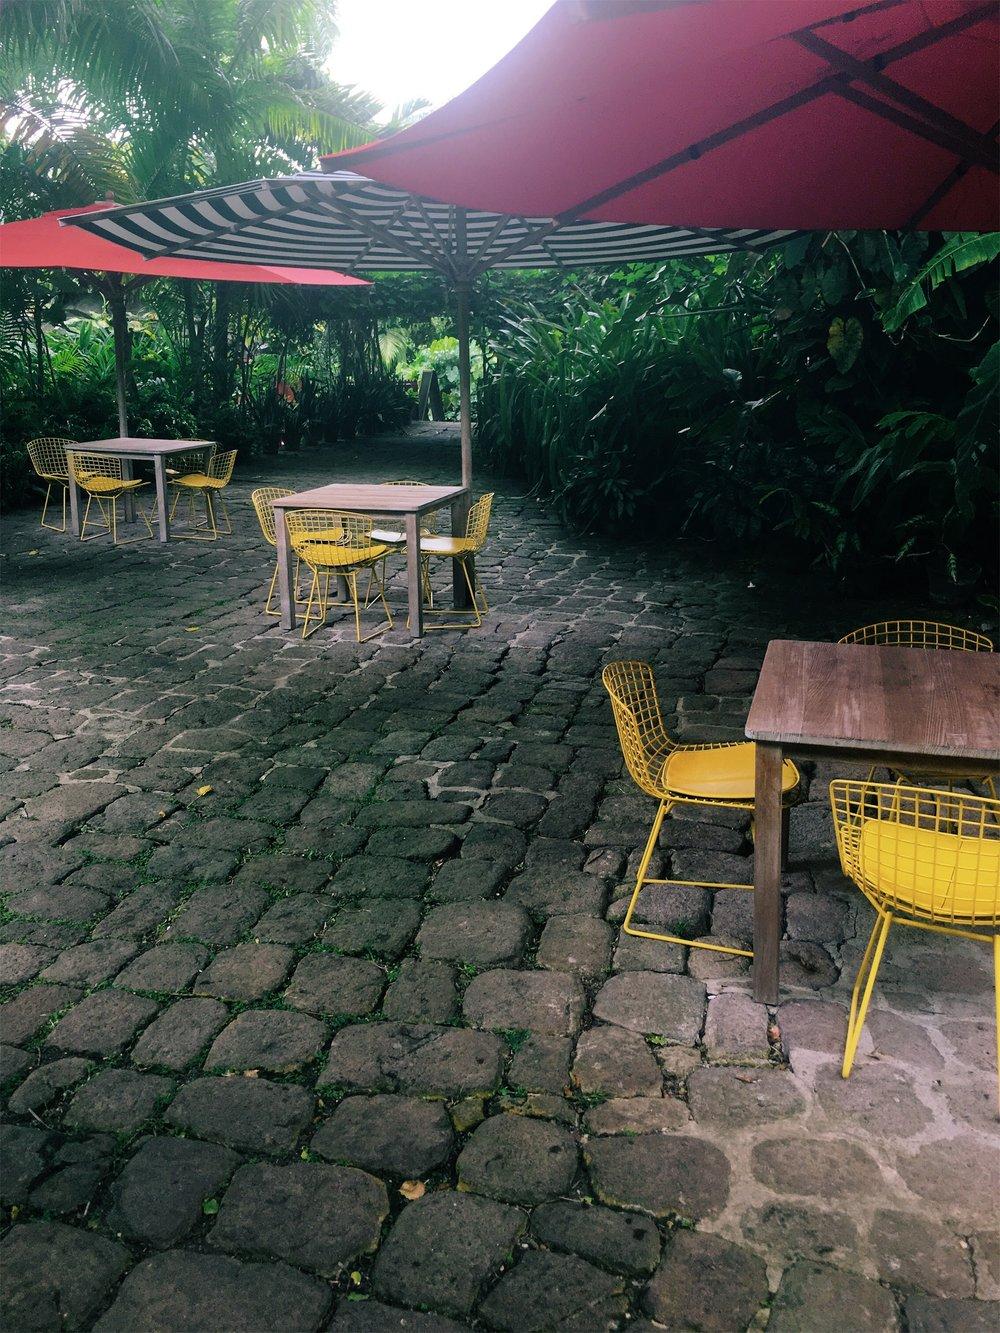 Colorful Bertoia chairs at Golden Rock Inn.